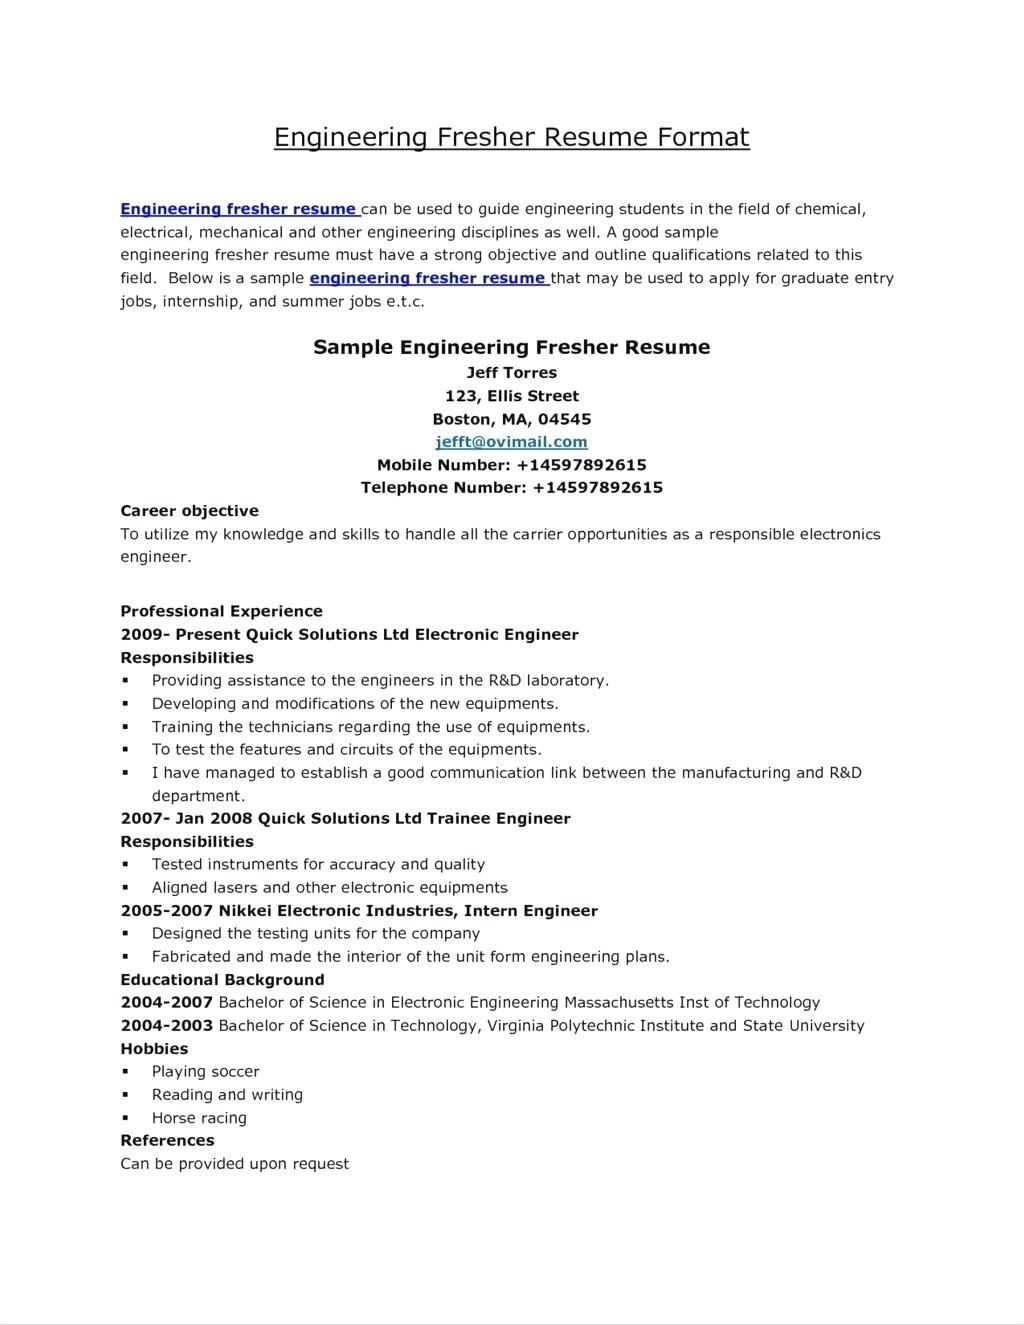 Free Electrical Engineer Fresher Resume Template Engineering Resume Templates Resume Design Free Job Resume Template